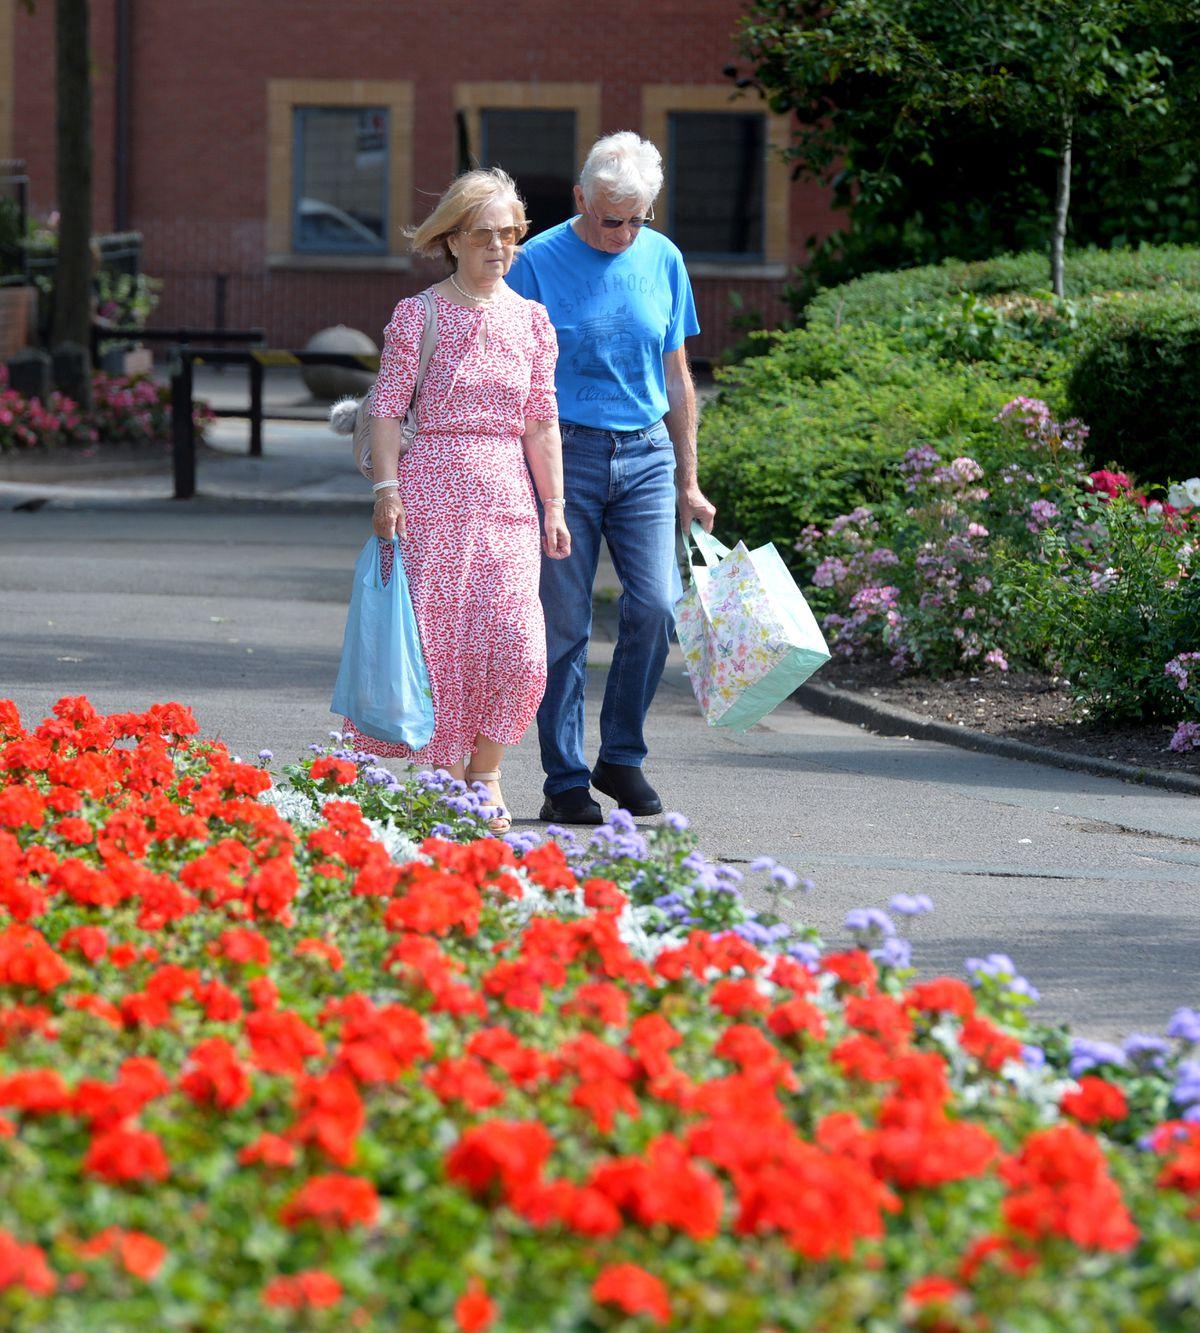 Walking in the flowers in Cannock Park